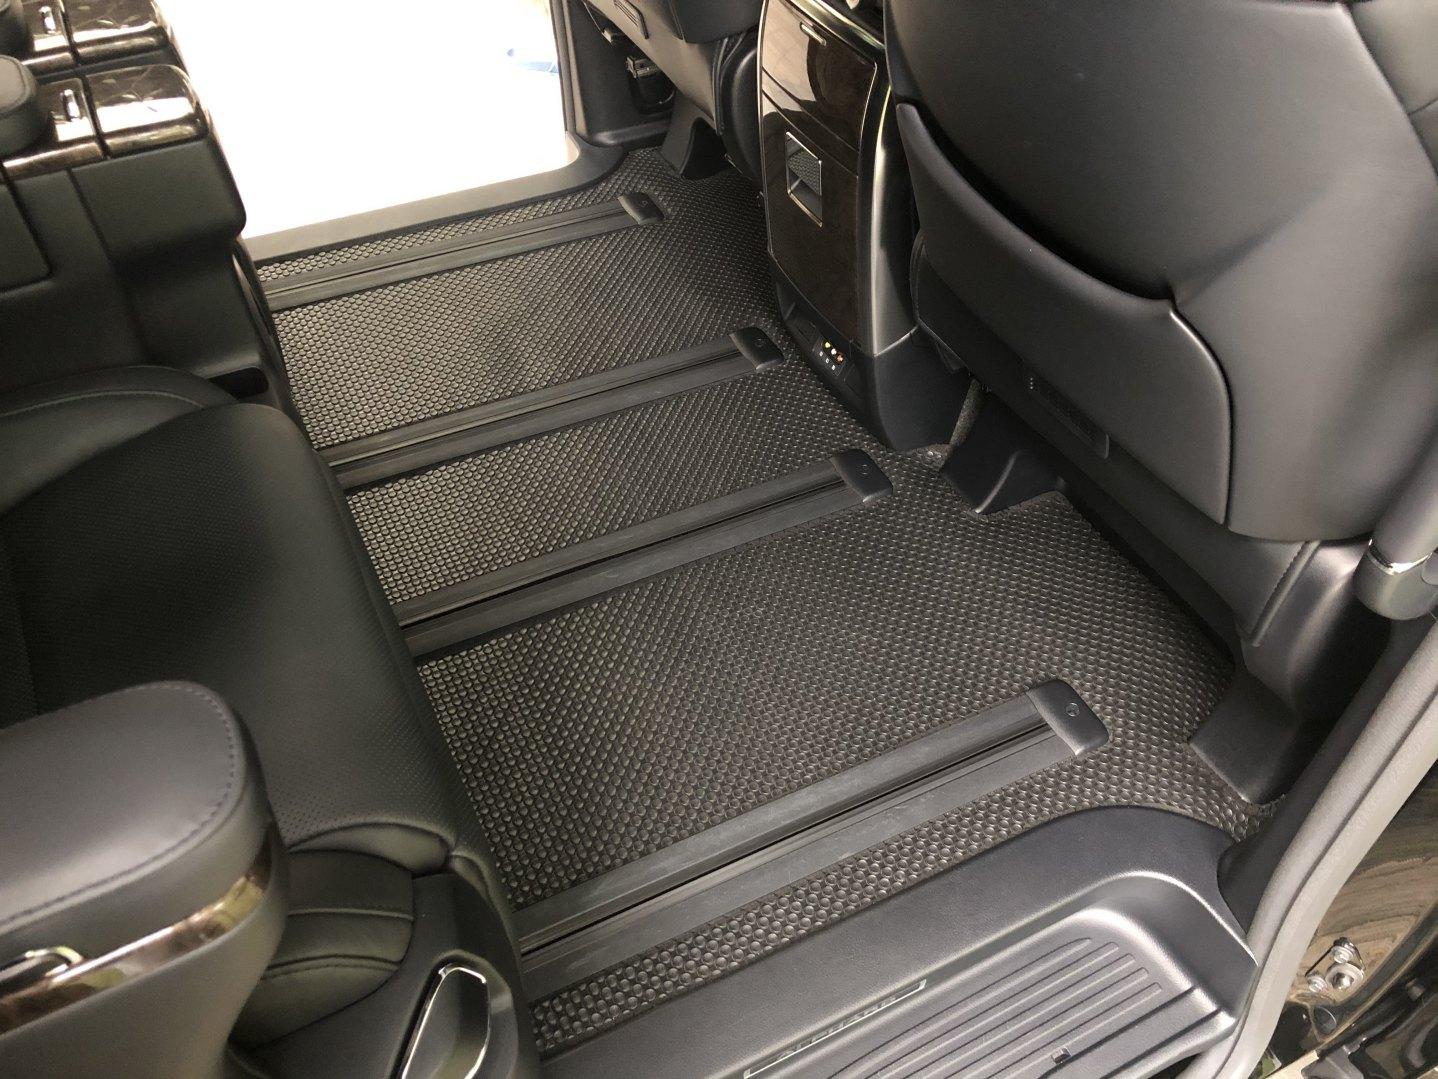 Thảm lót sàn Toyota Alphard